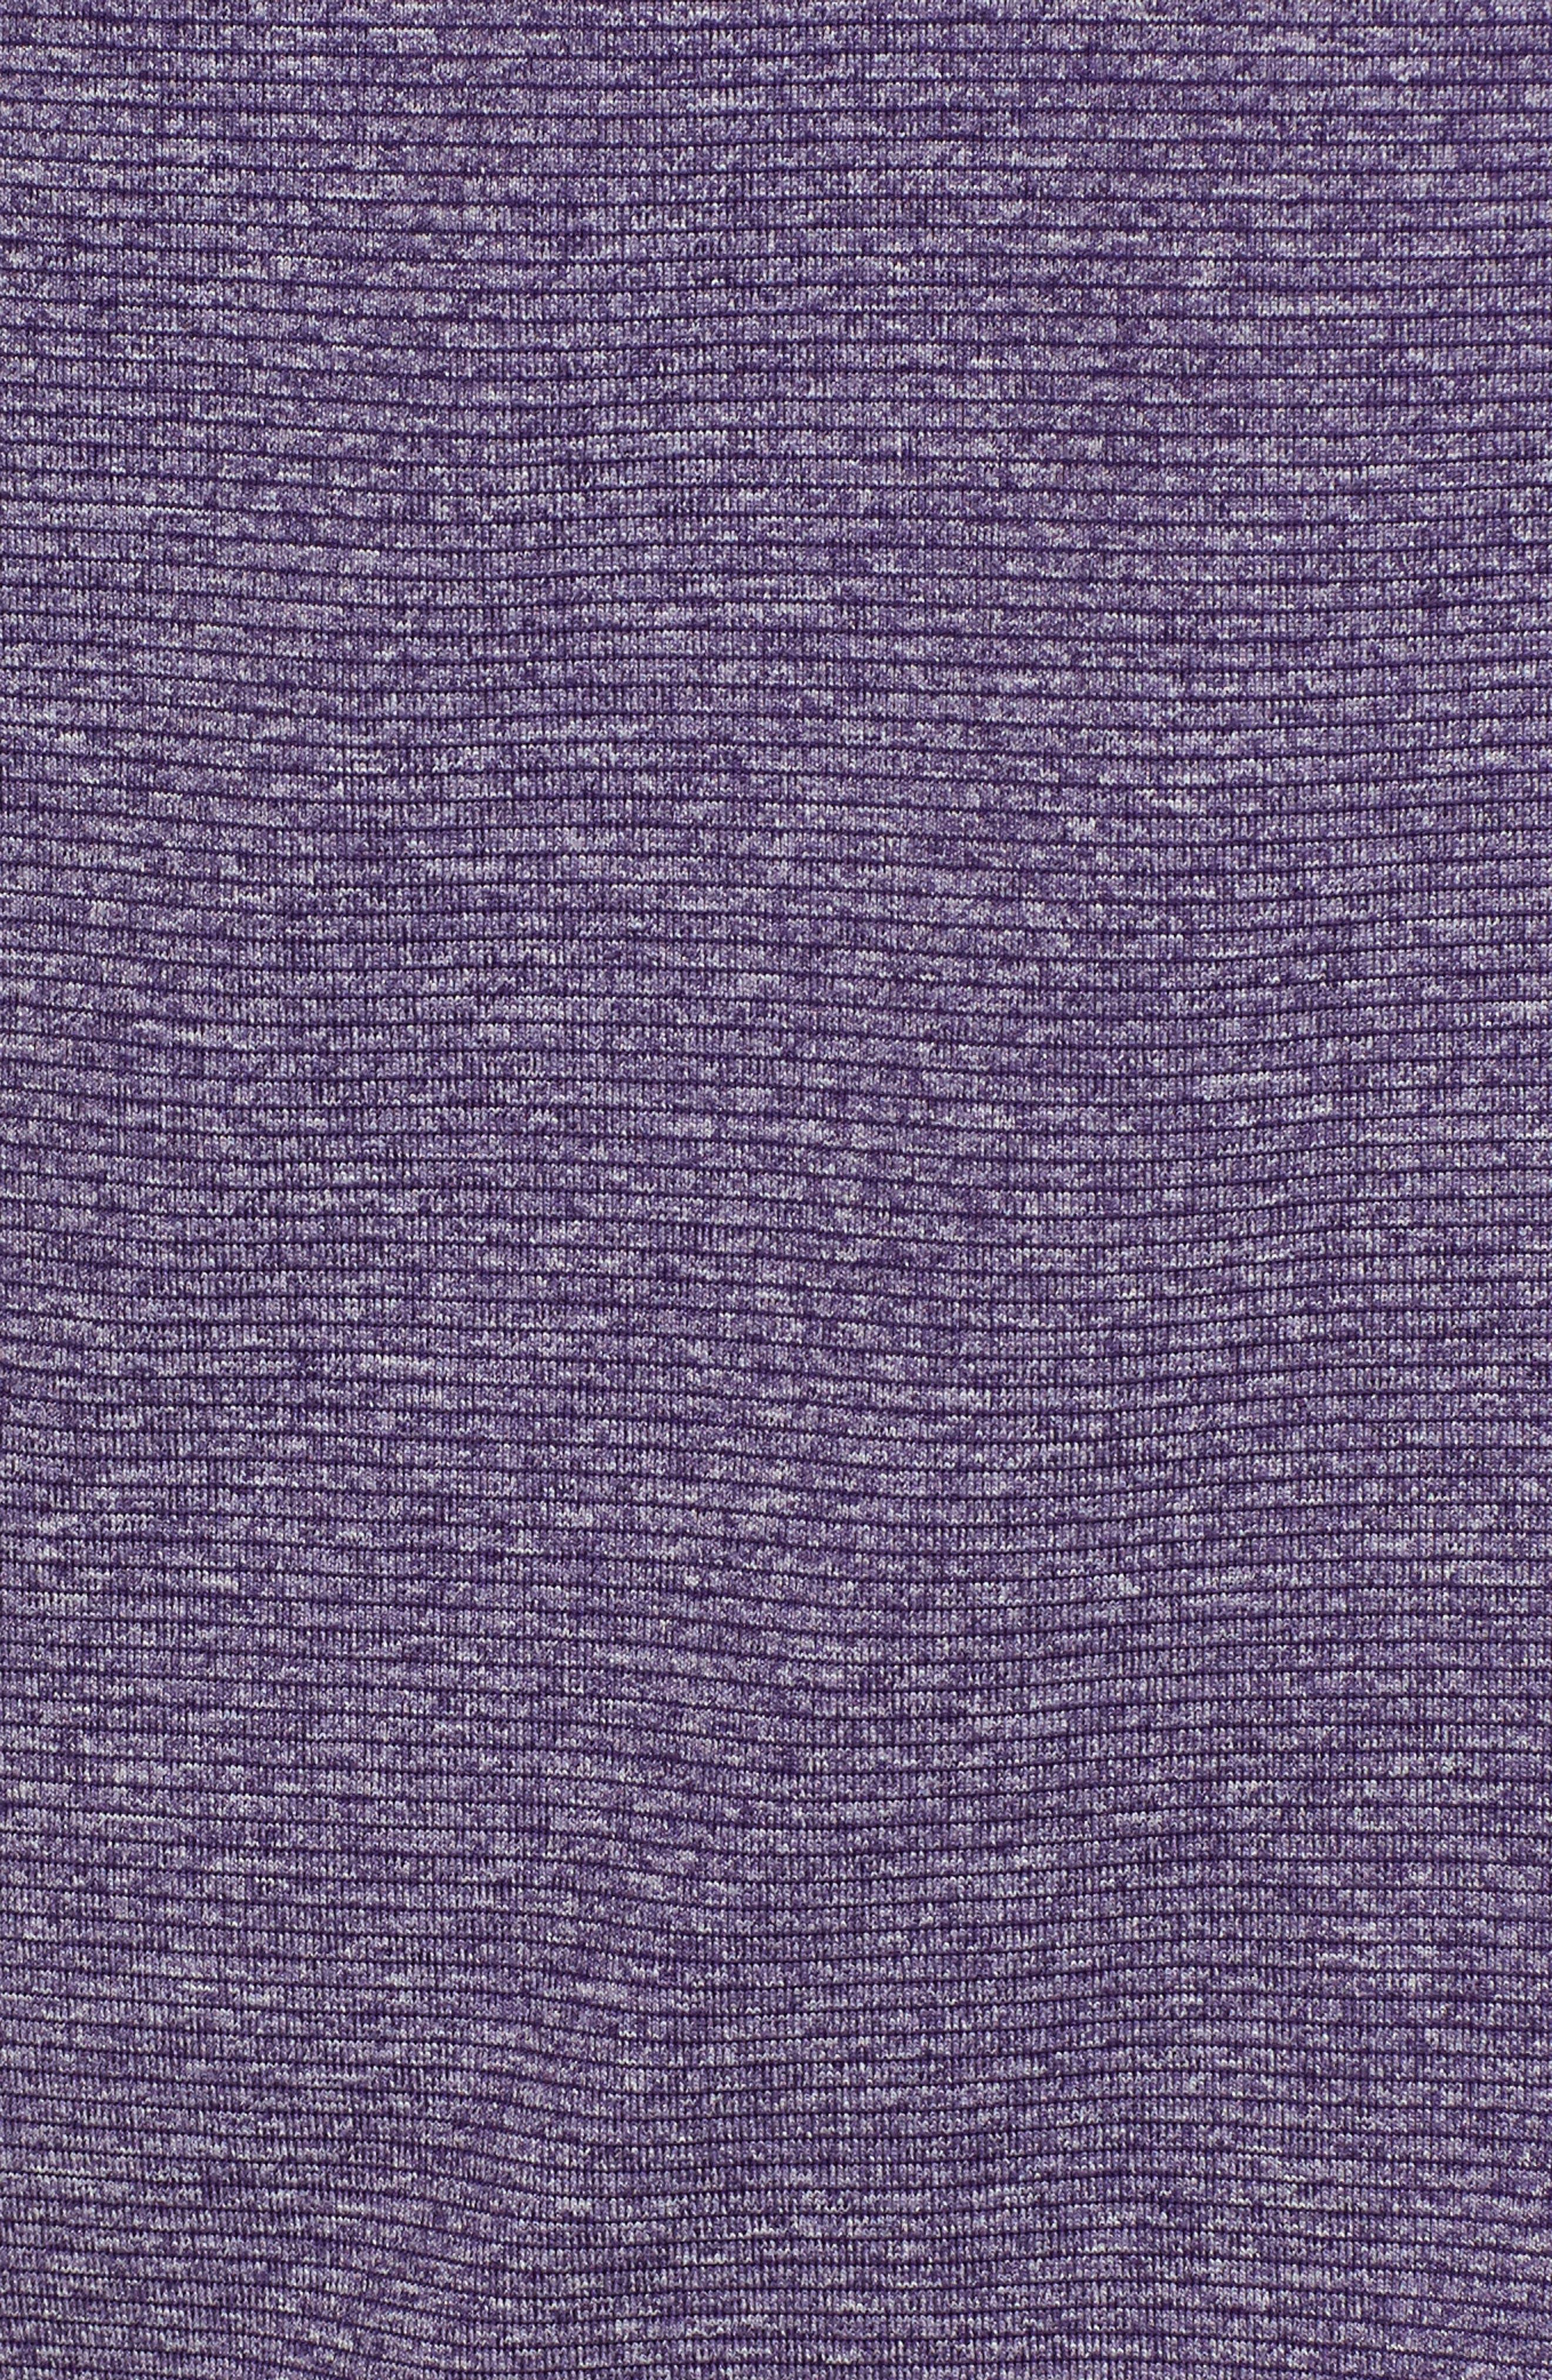 Shoreline - Minnesota Vikings Half Zip Pullover,                             Alternate thumbnail 5, color,                             College Purple Heather